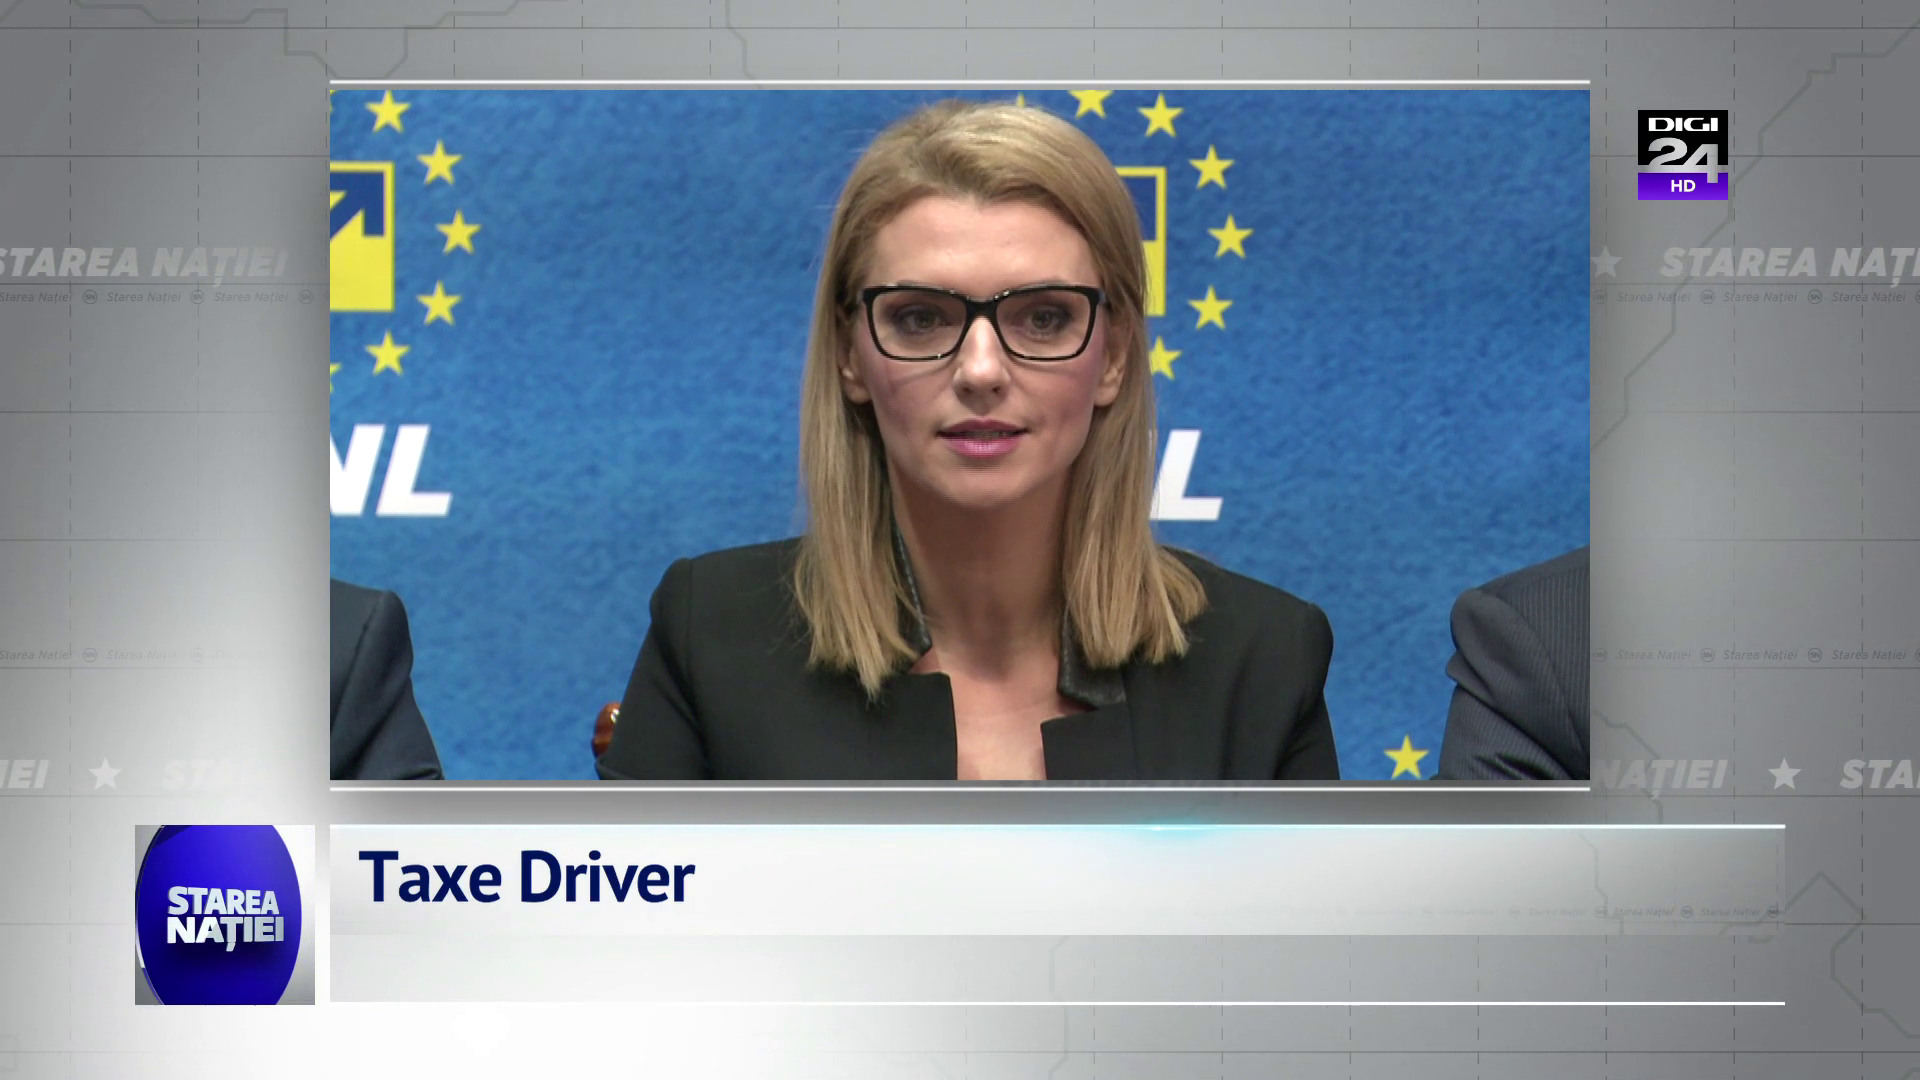 Taxe Driver